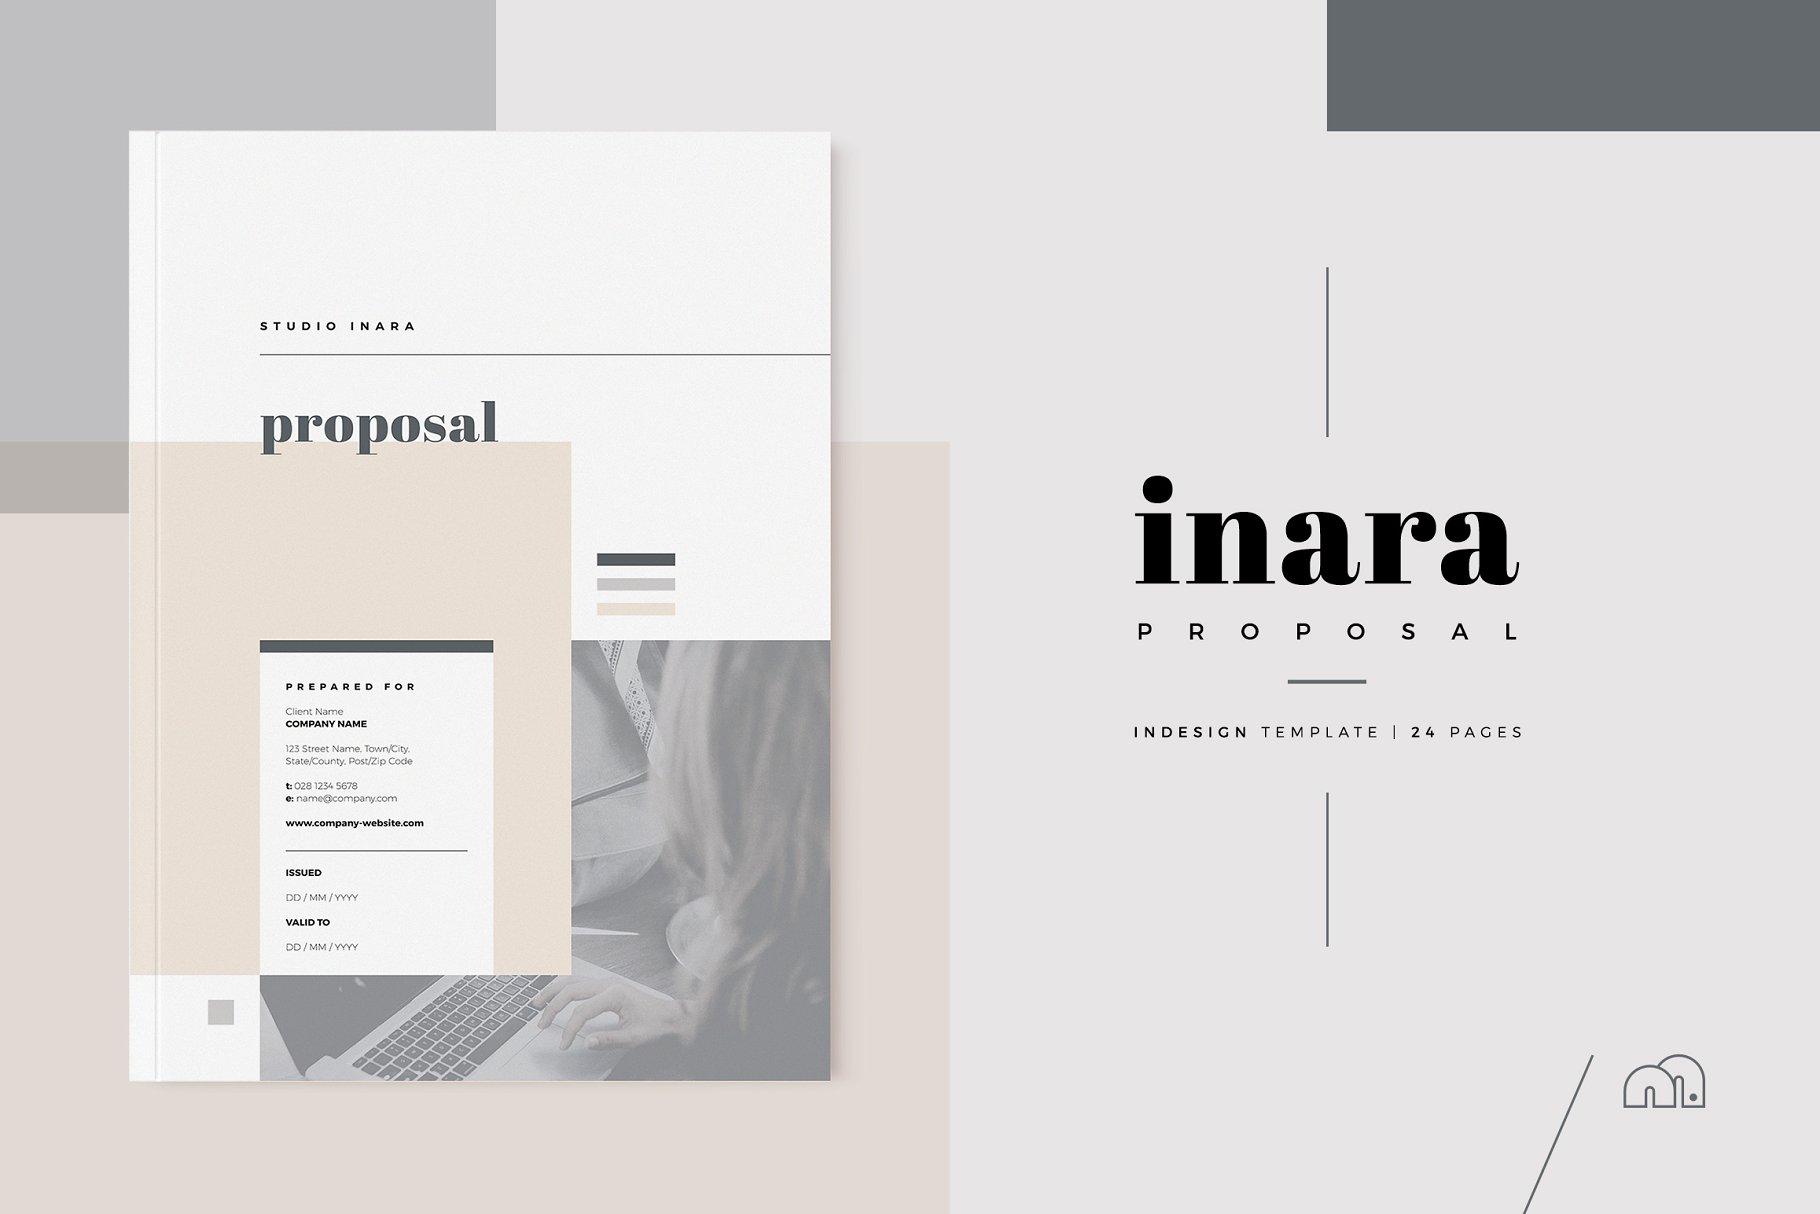 proposal-inara-preview-1-.jpg